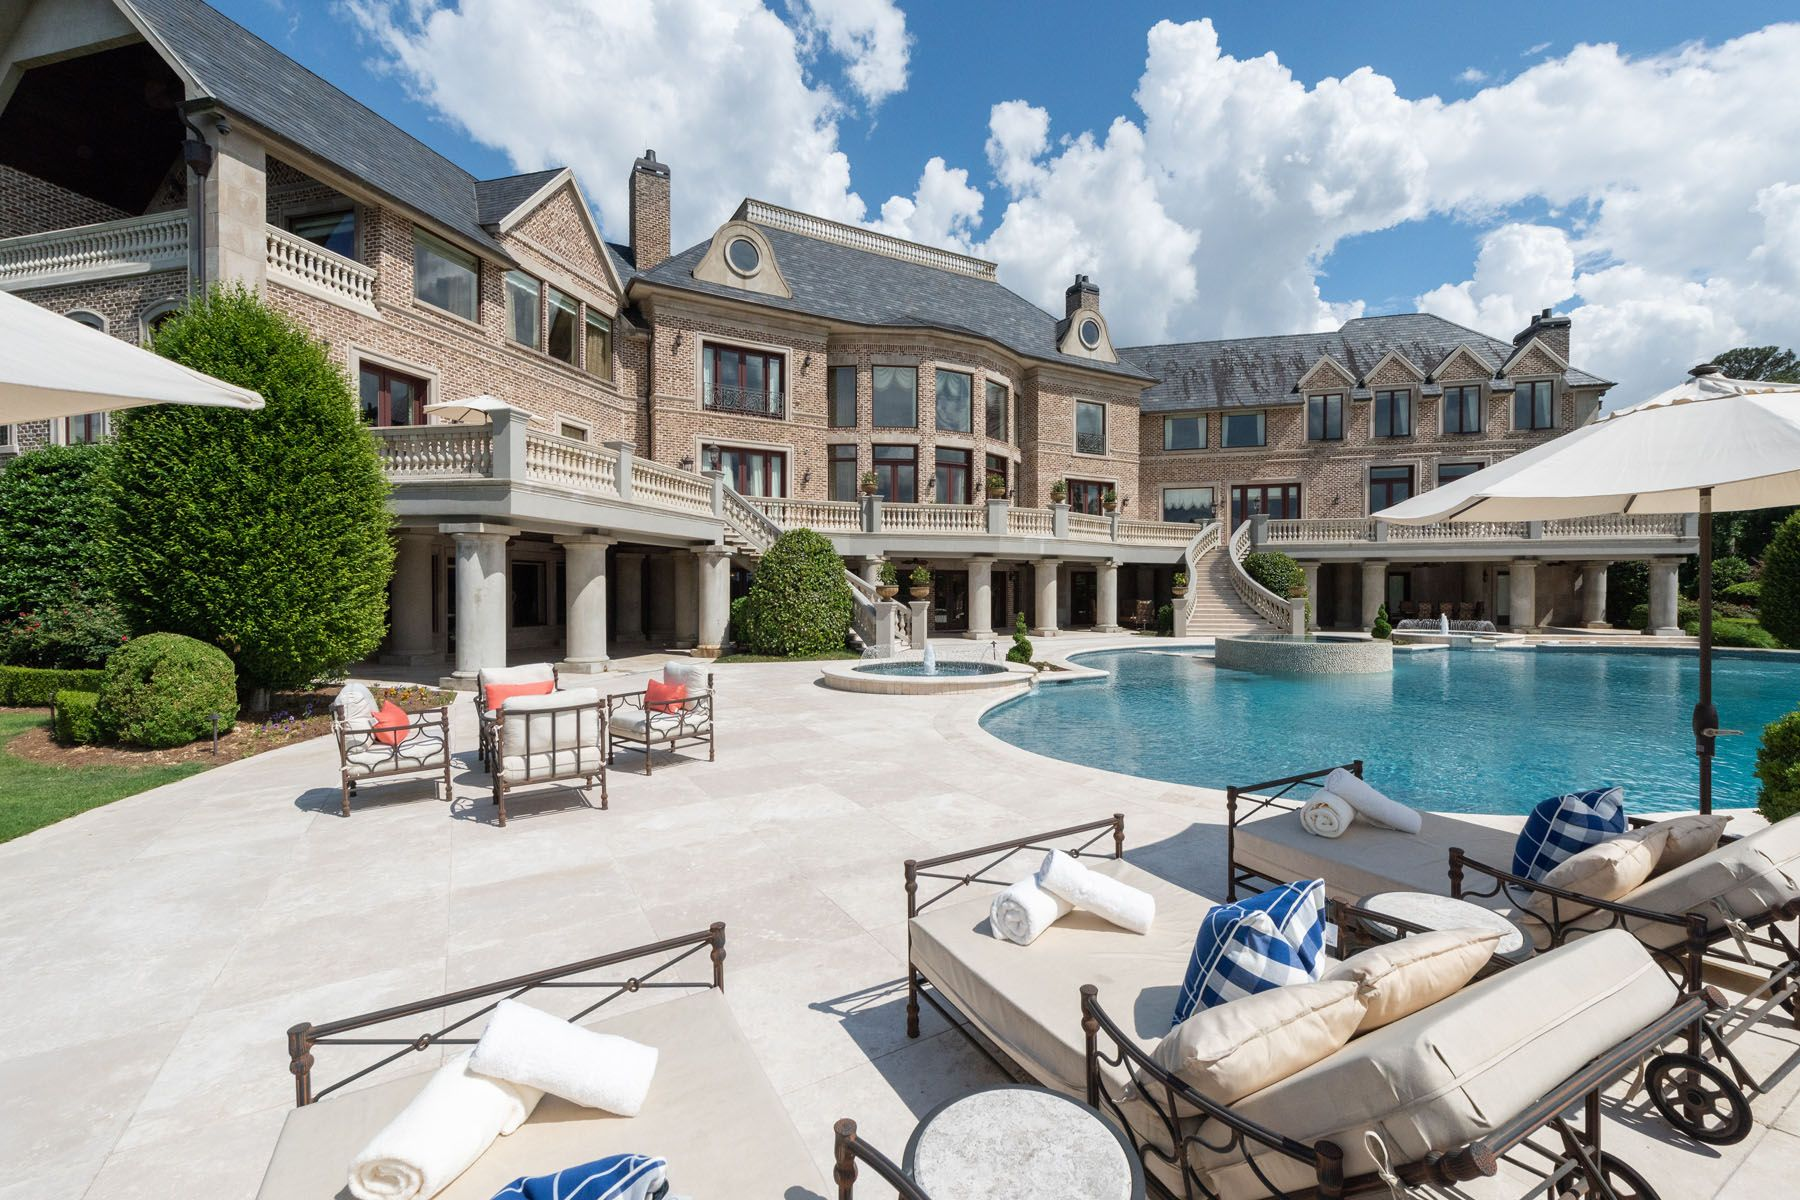 Atlanta S Most Spectacular Gated Estate Nestled On 17 Parklike Acres Atlanta Mansions Mansions Expensive Houses